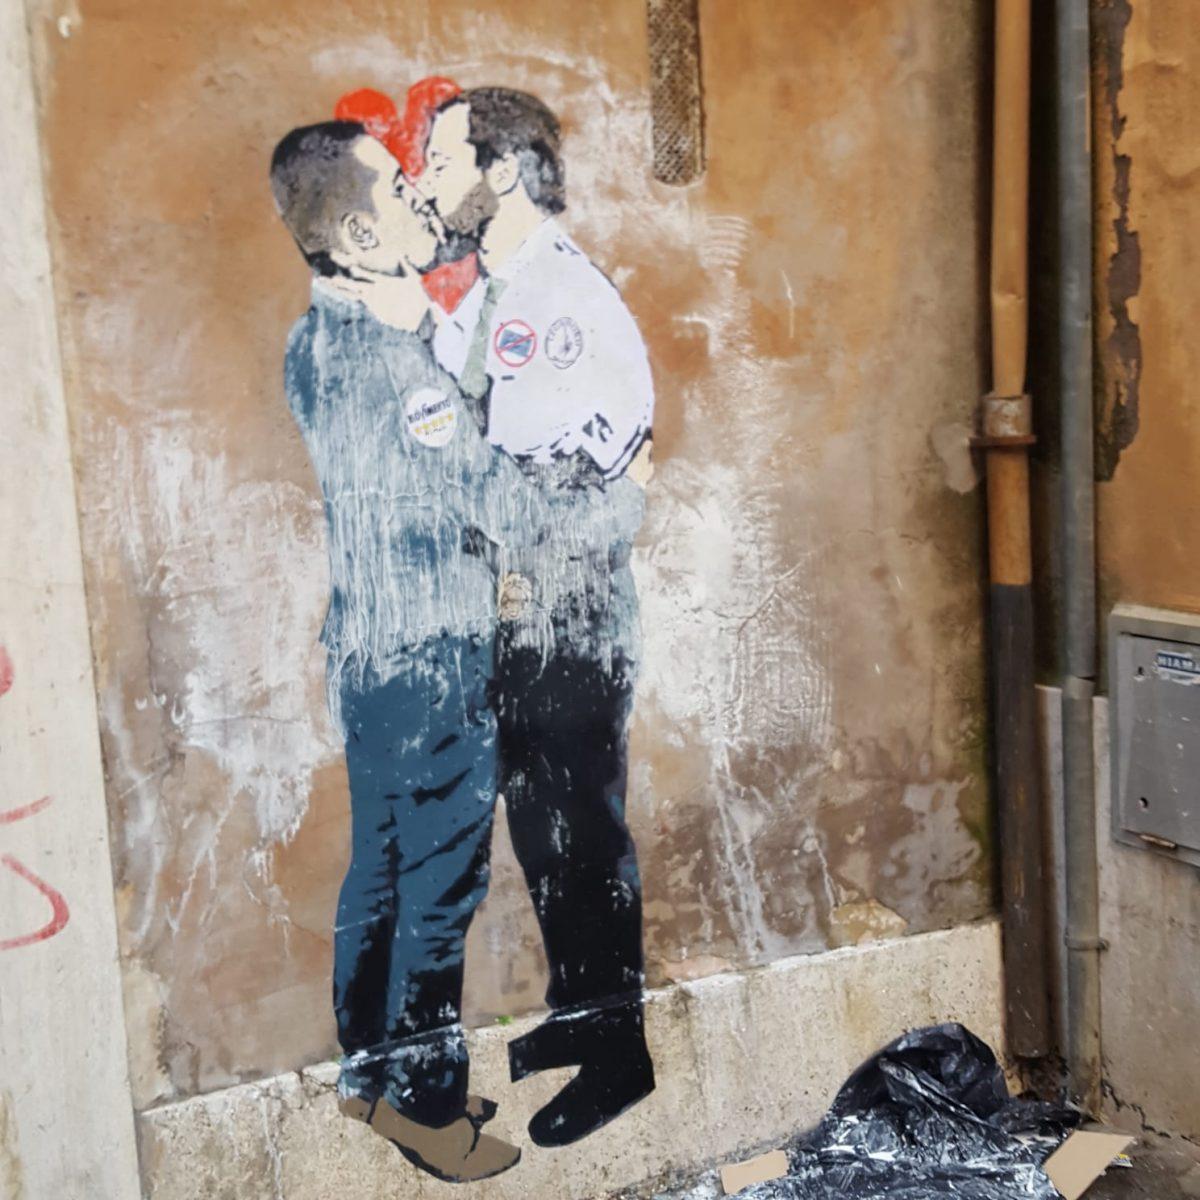 A Roma spunta un murales con un bacio tra Di Maio e Salvini